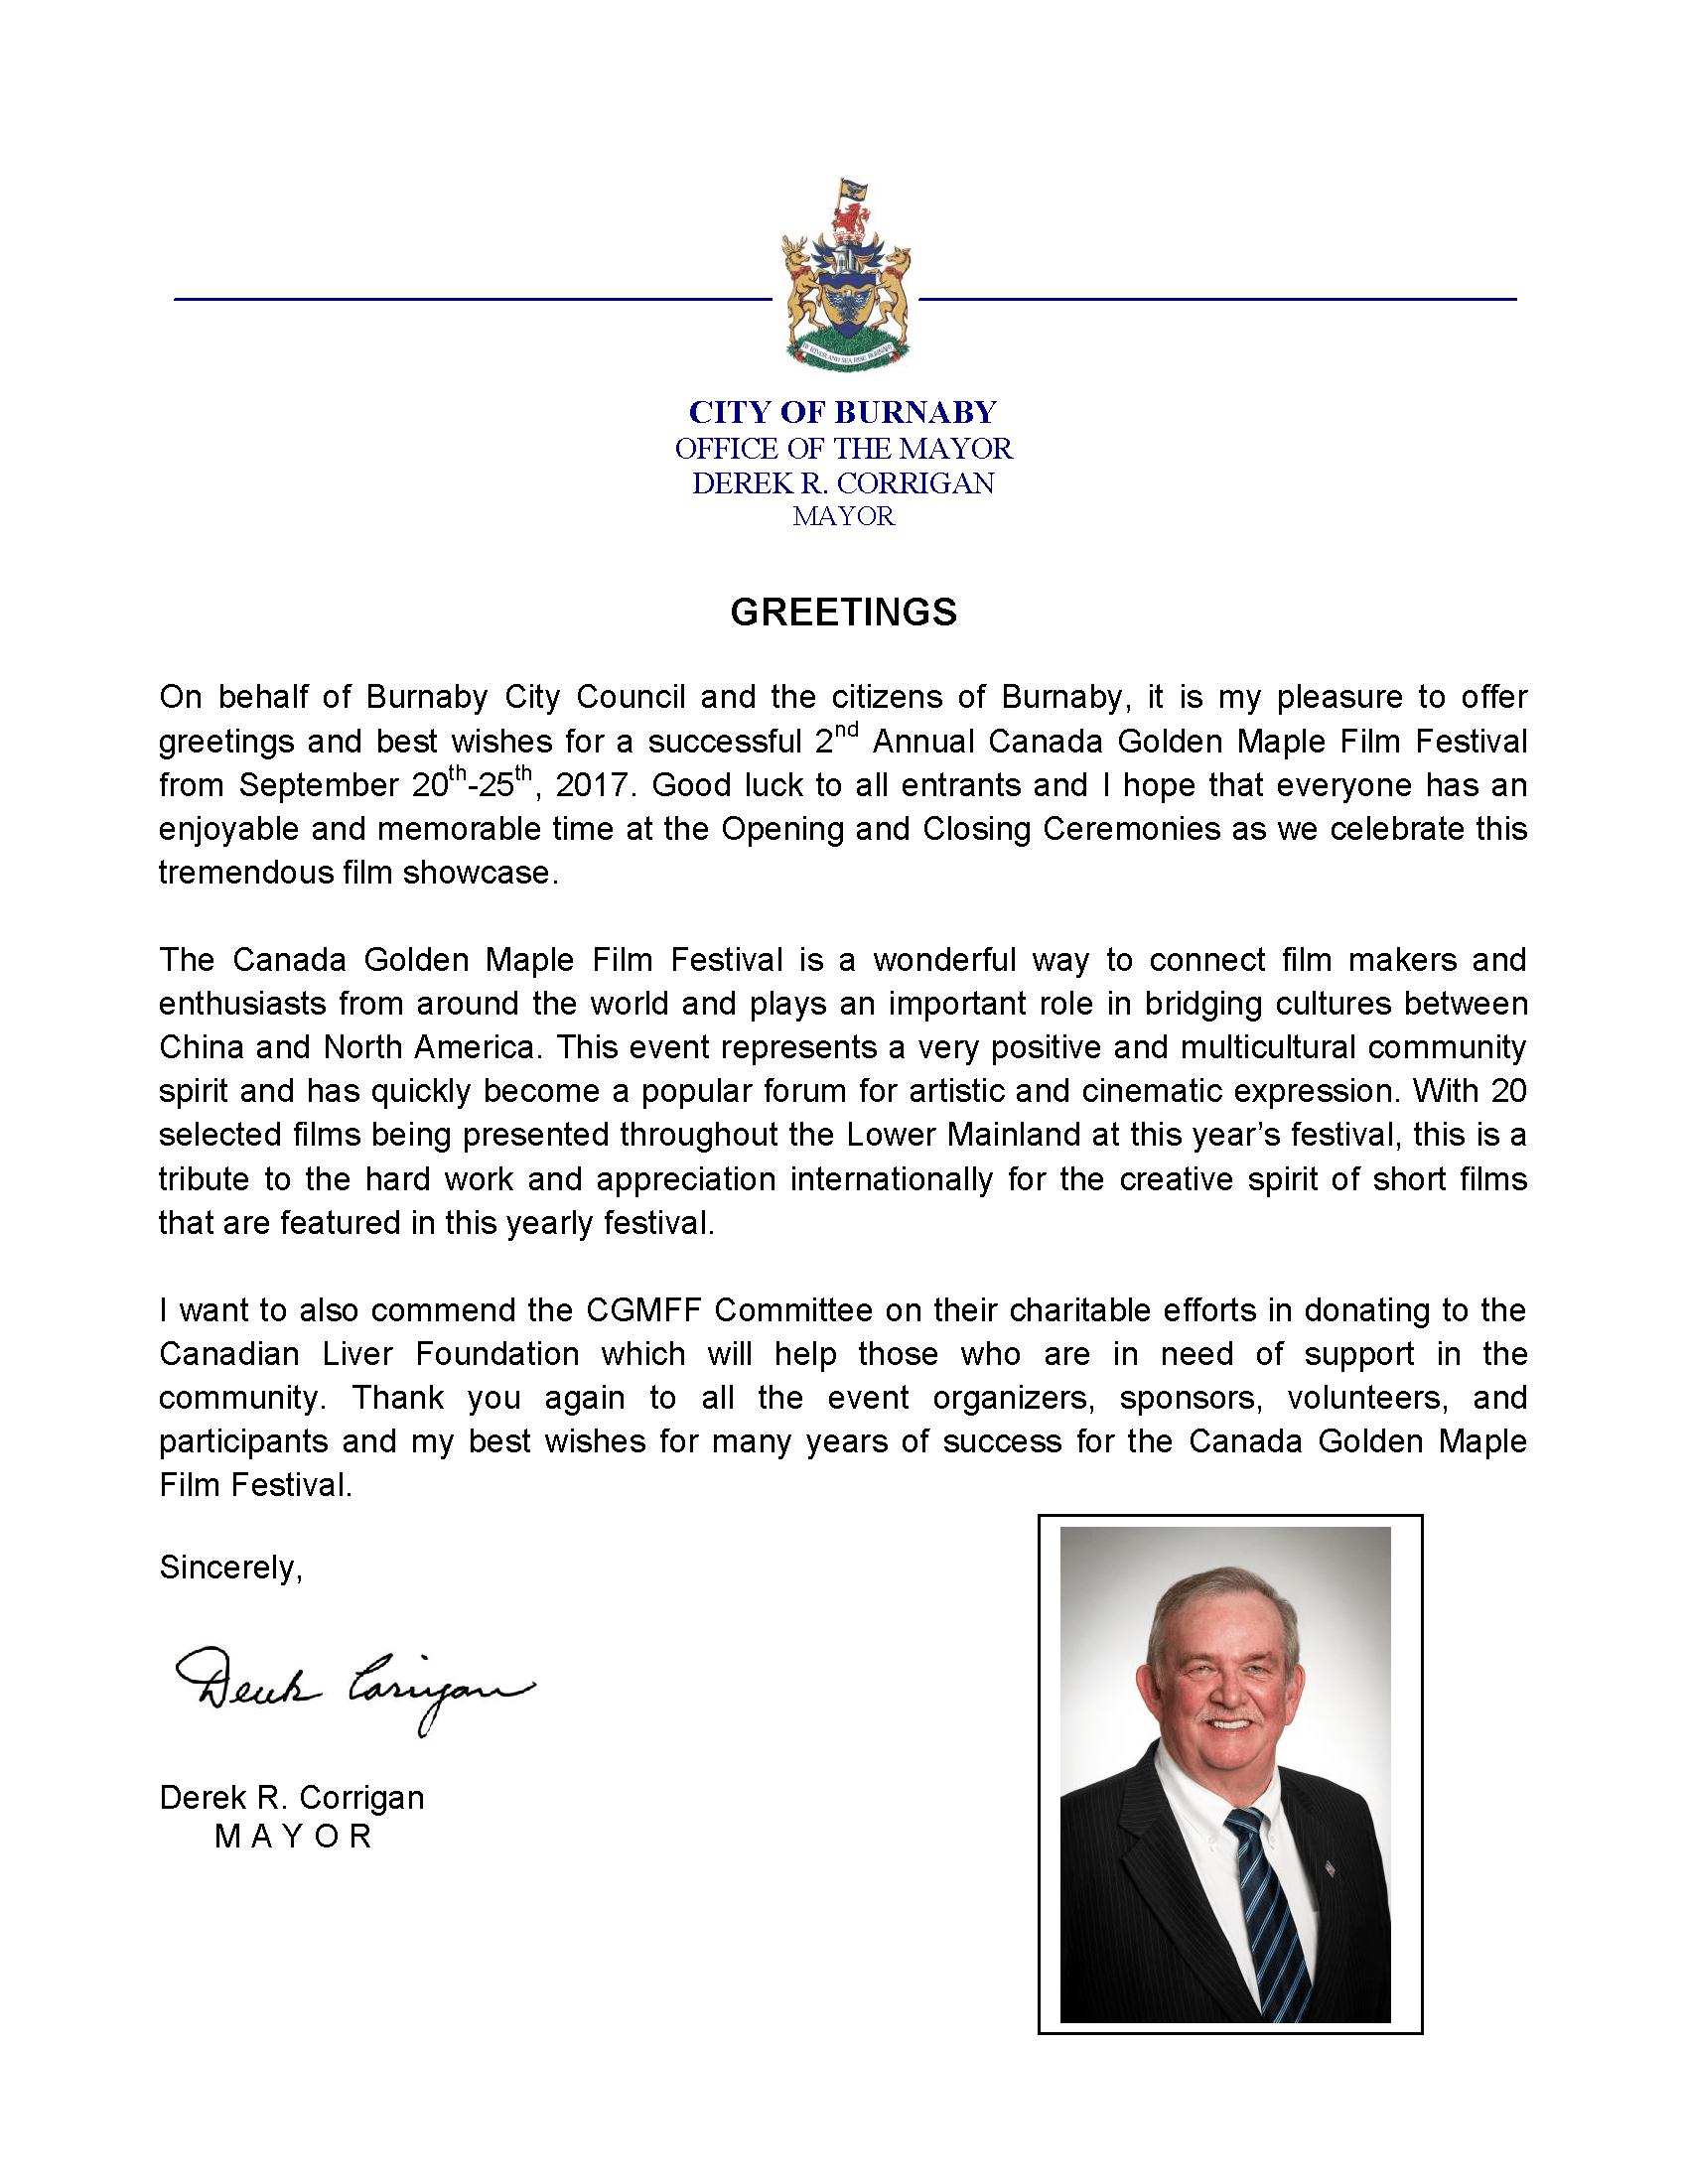 Congratulatory Letter from Derek R. Corrigan, Mayor of Burnaby